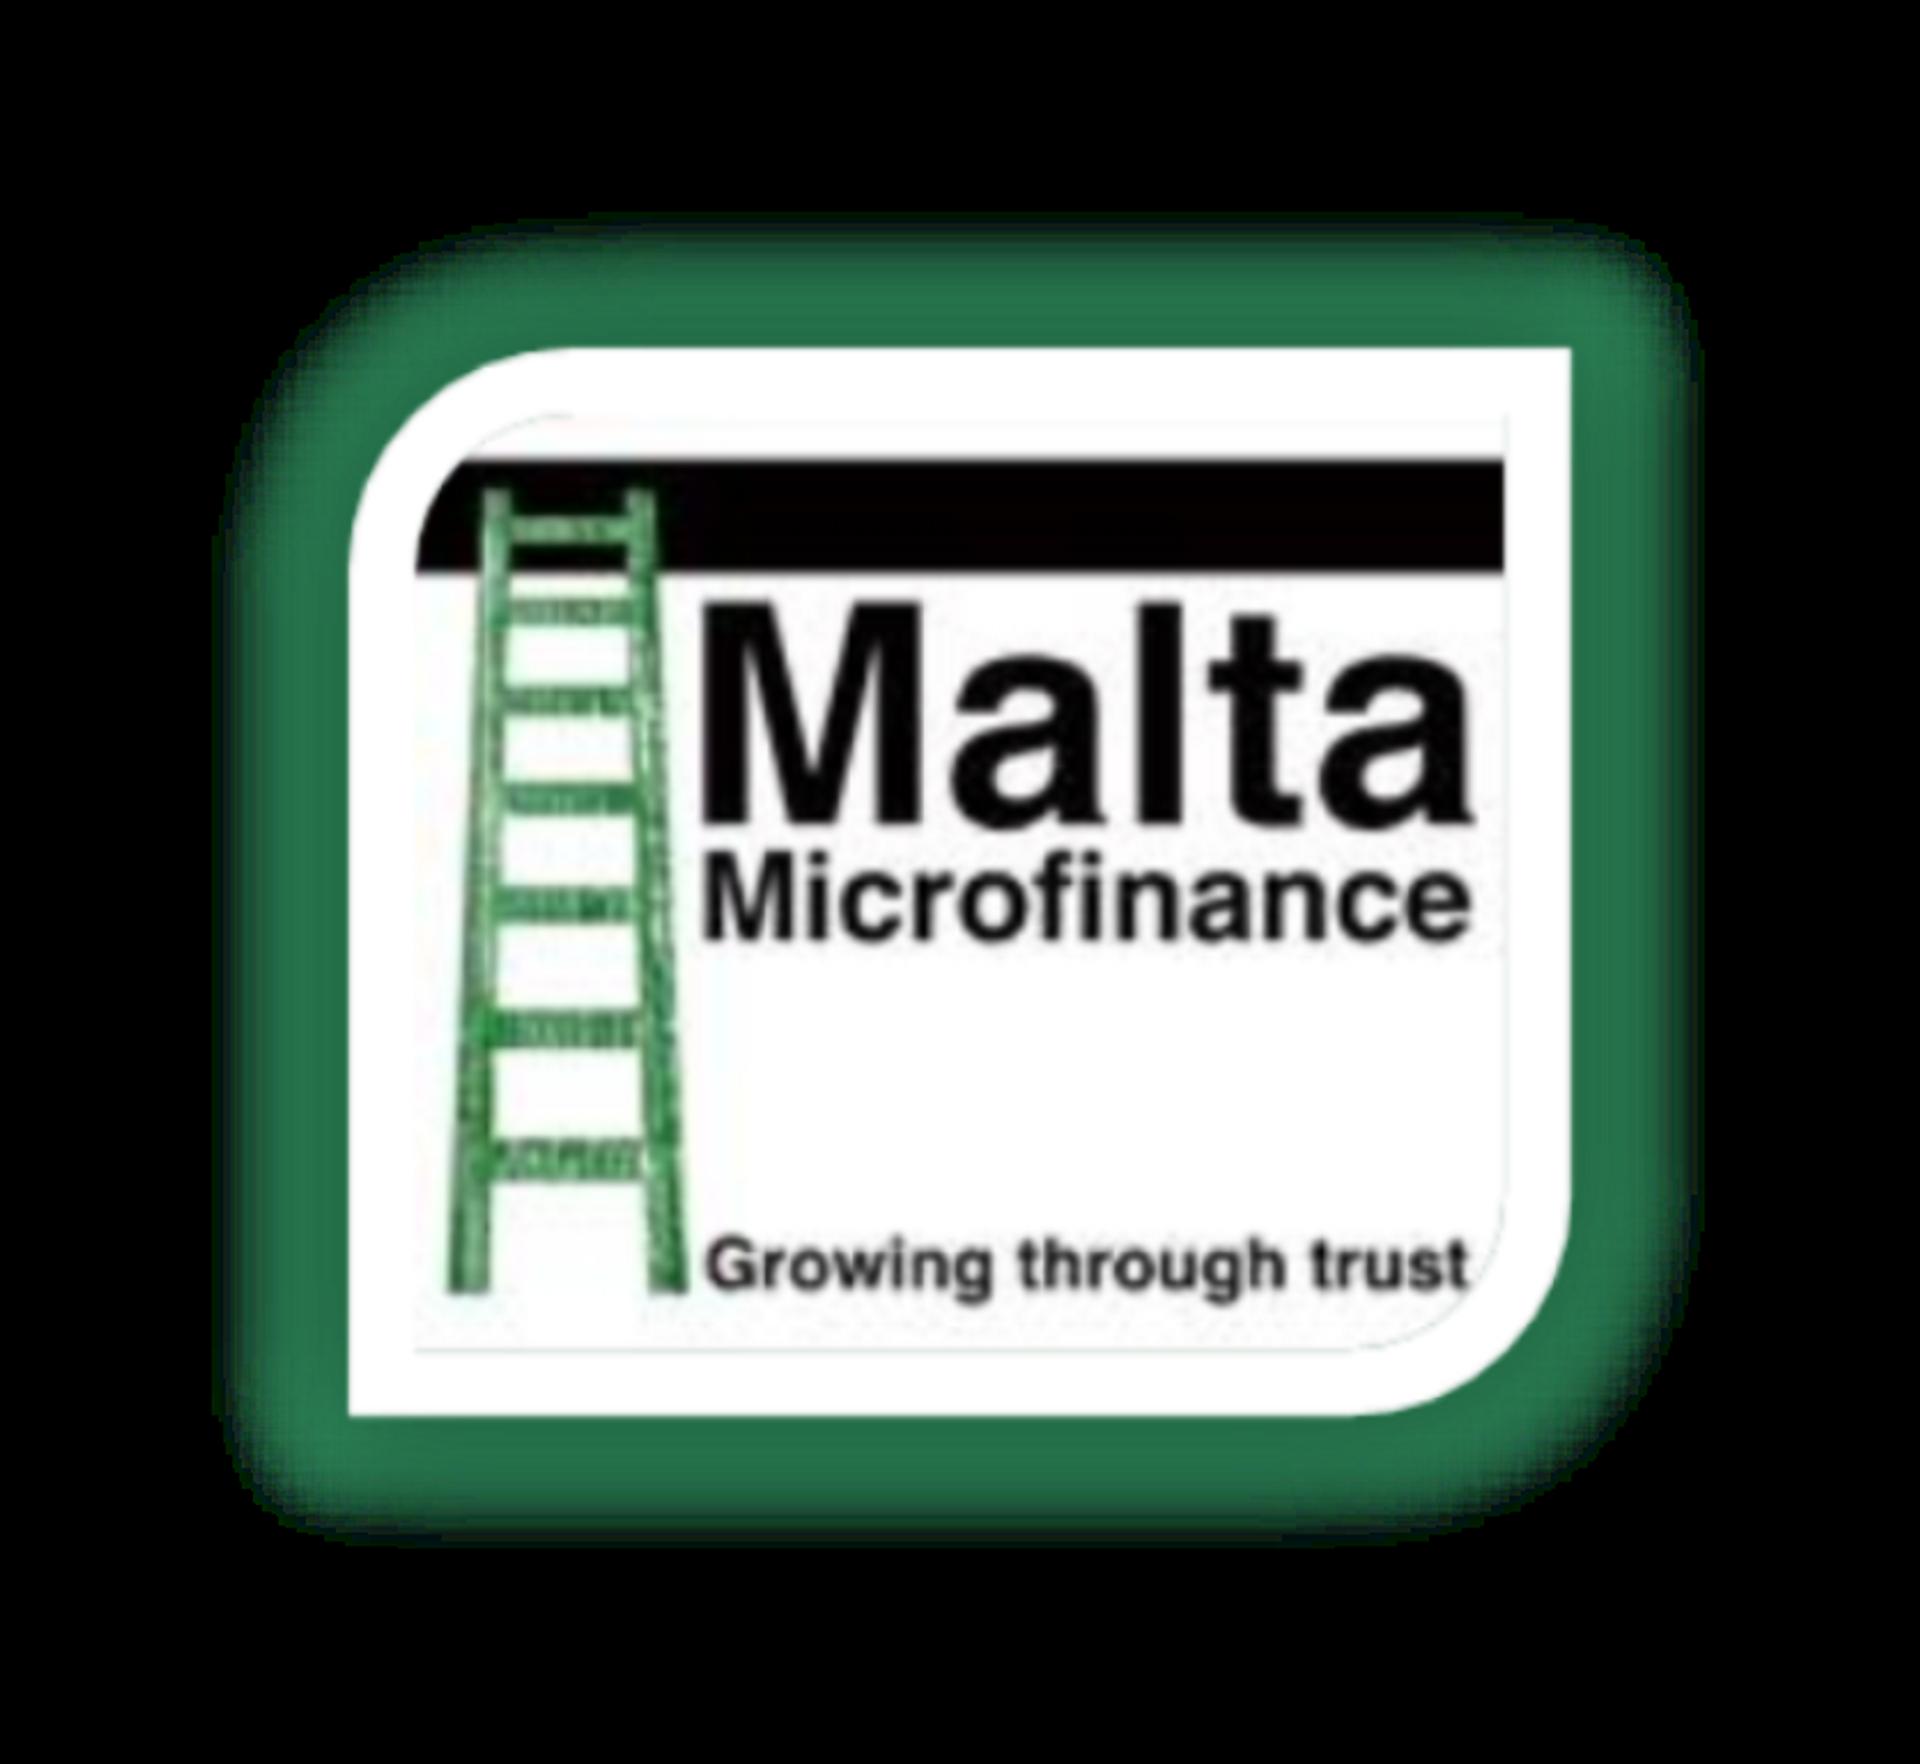 Malta Microfinance